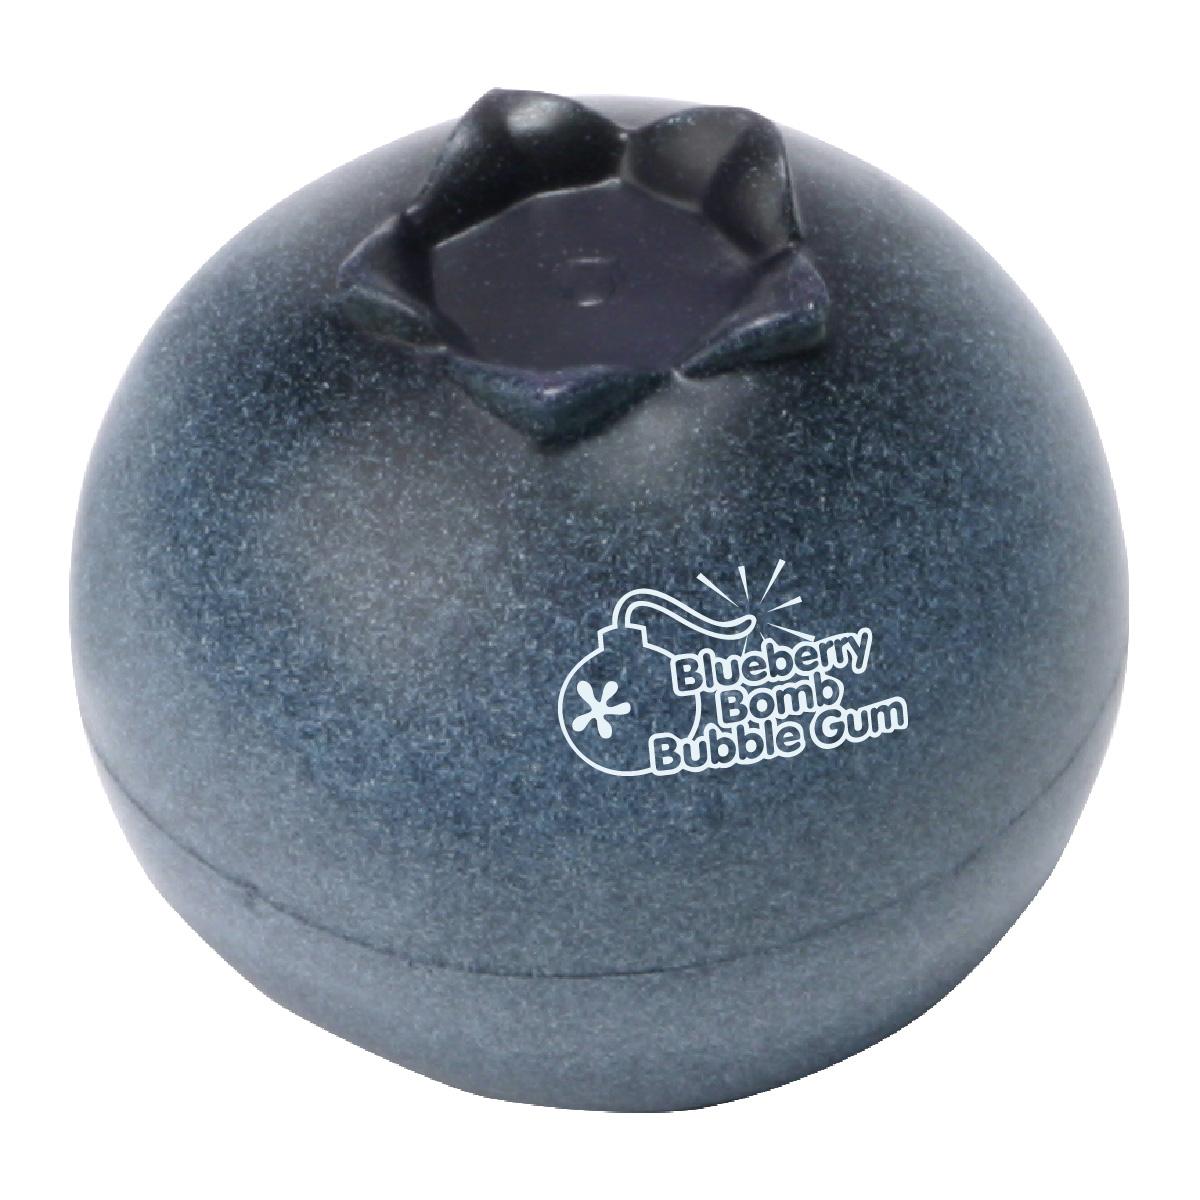 Blueberry Stress Reliever, LFR-BB07, 1 Colour Imprint